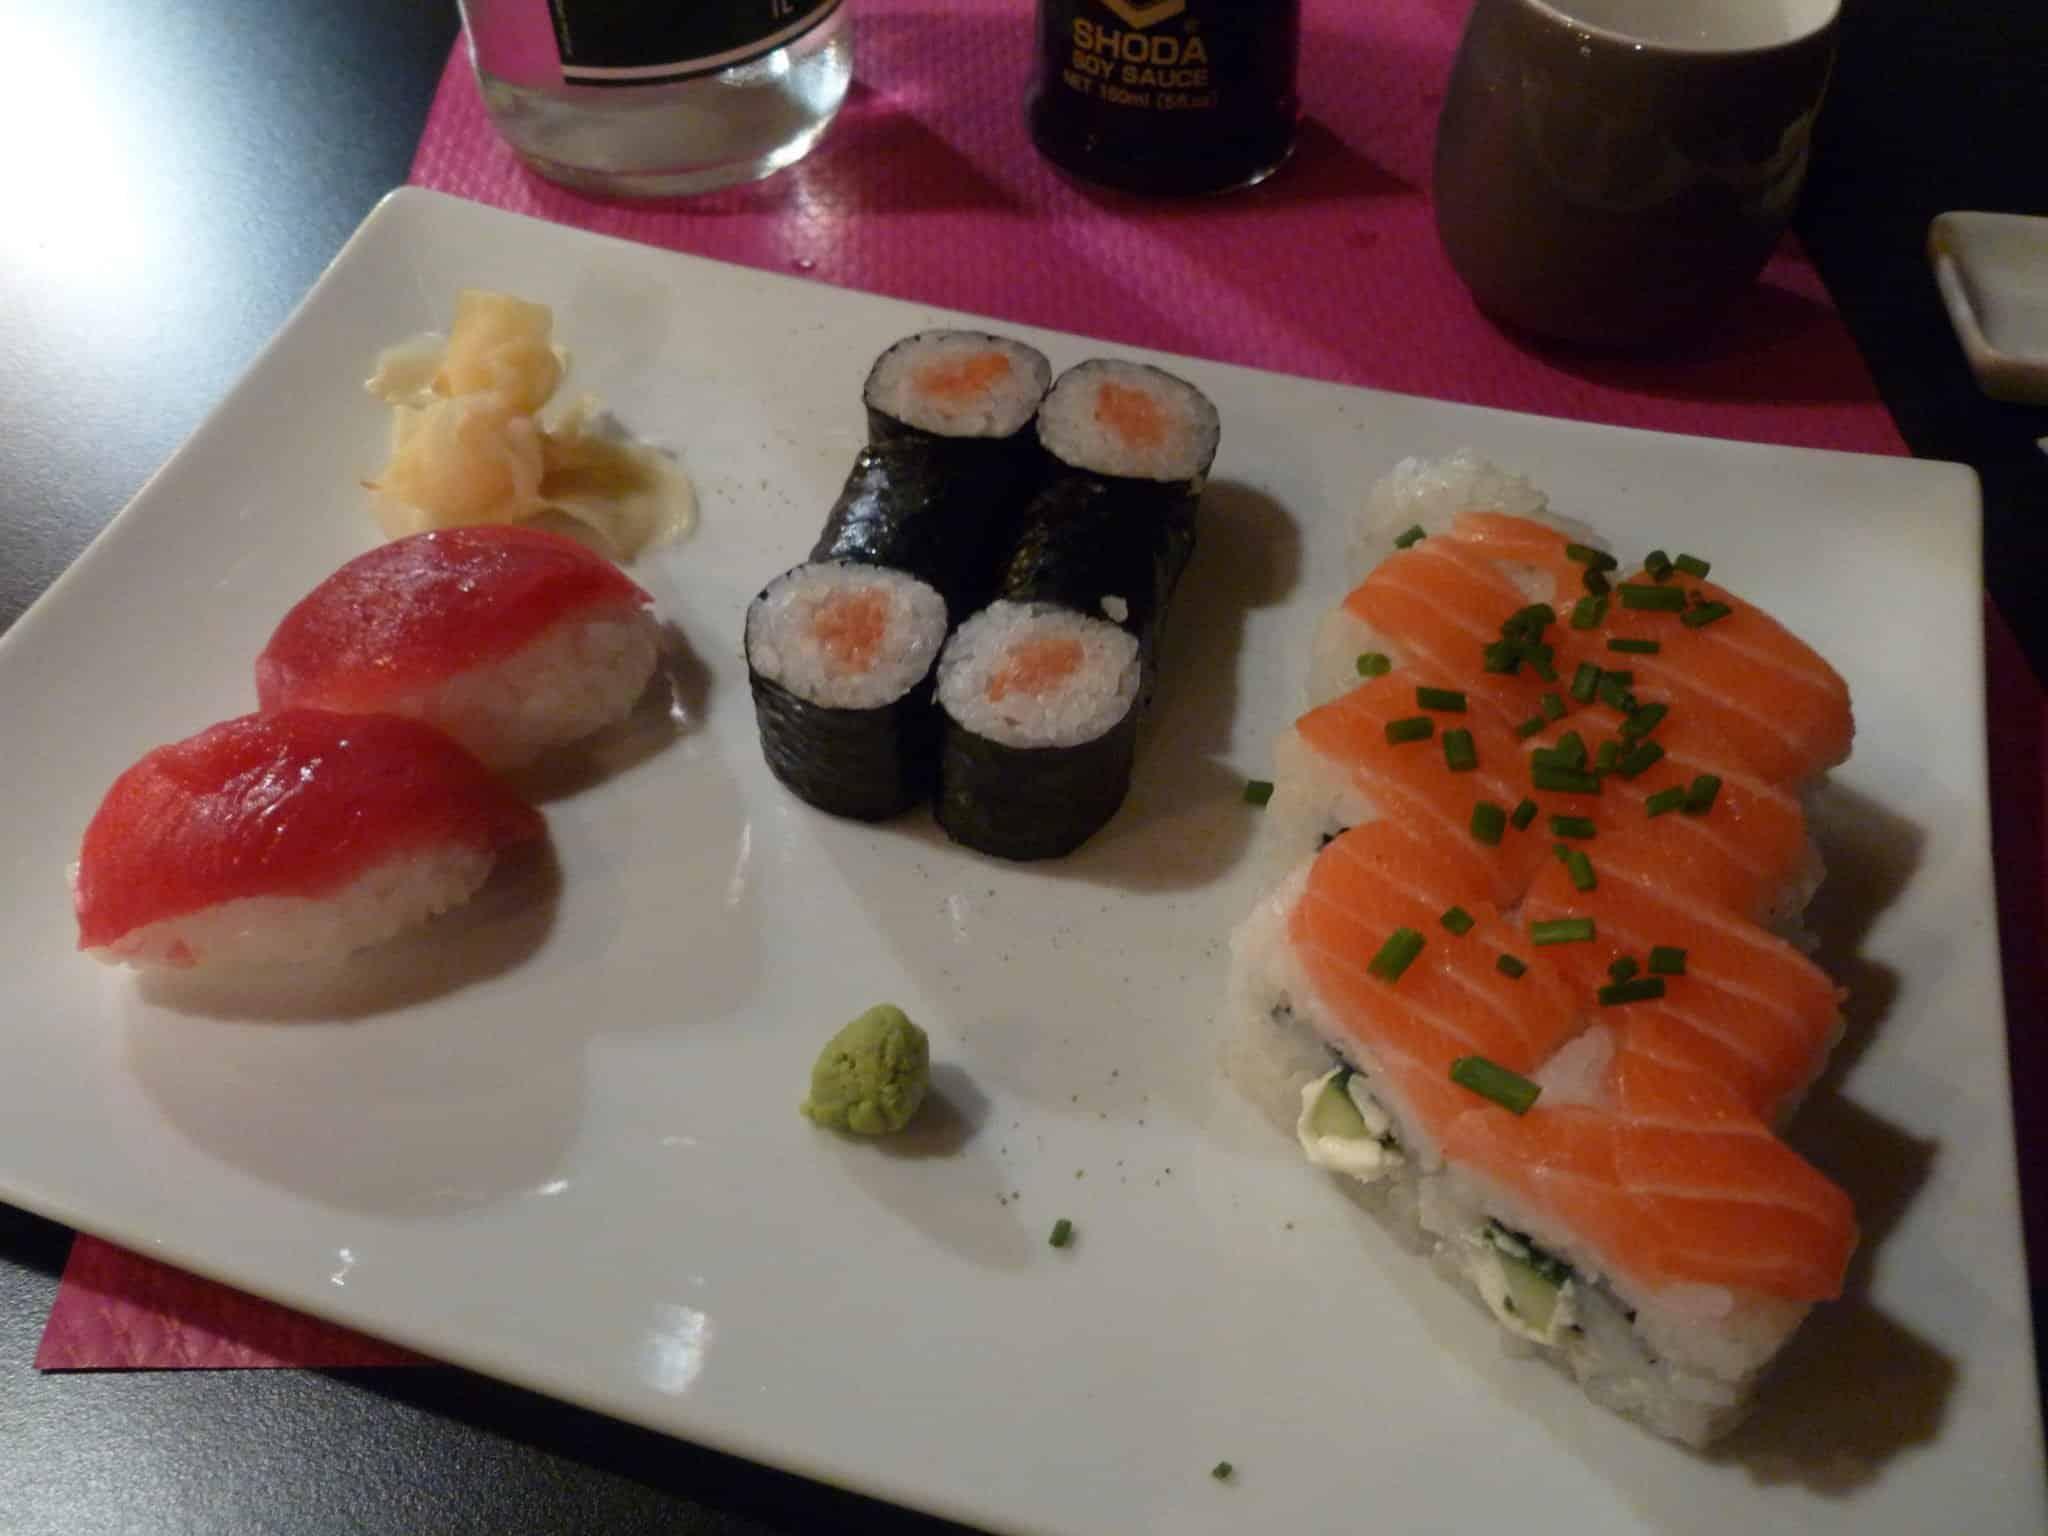 O manger des sushis salon de provence for Hai sushi salon de provence